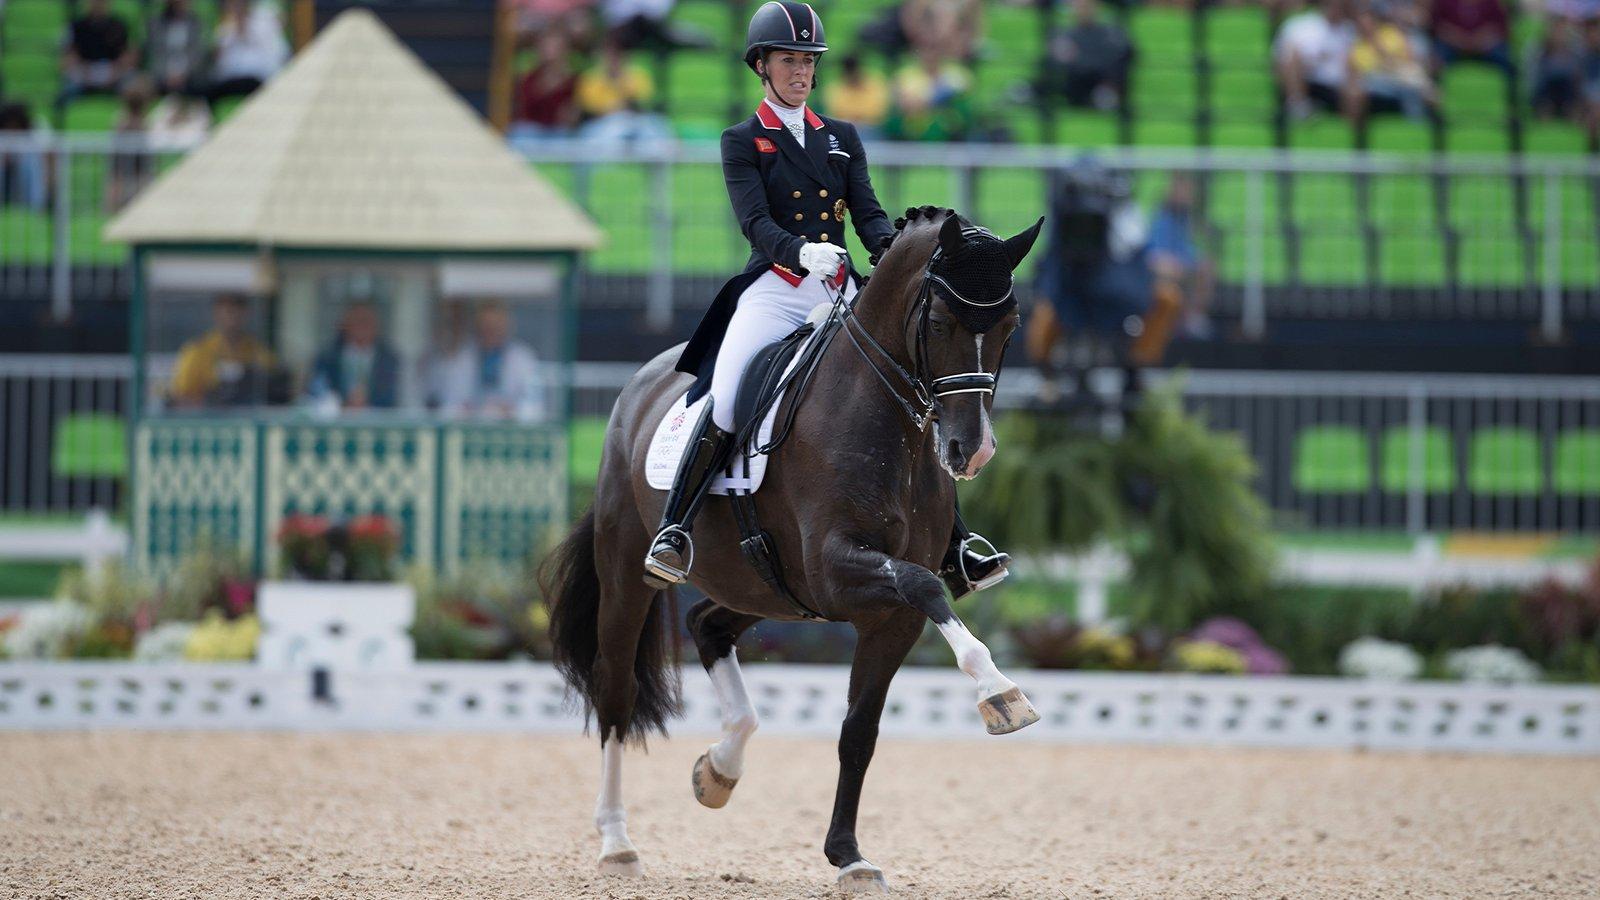 Charlotte dujardin en valegro pakken opnieuw olympisch for Charlotte dujardin